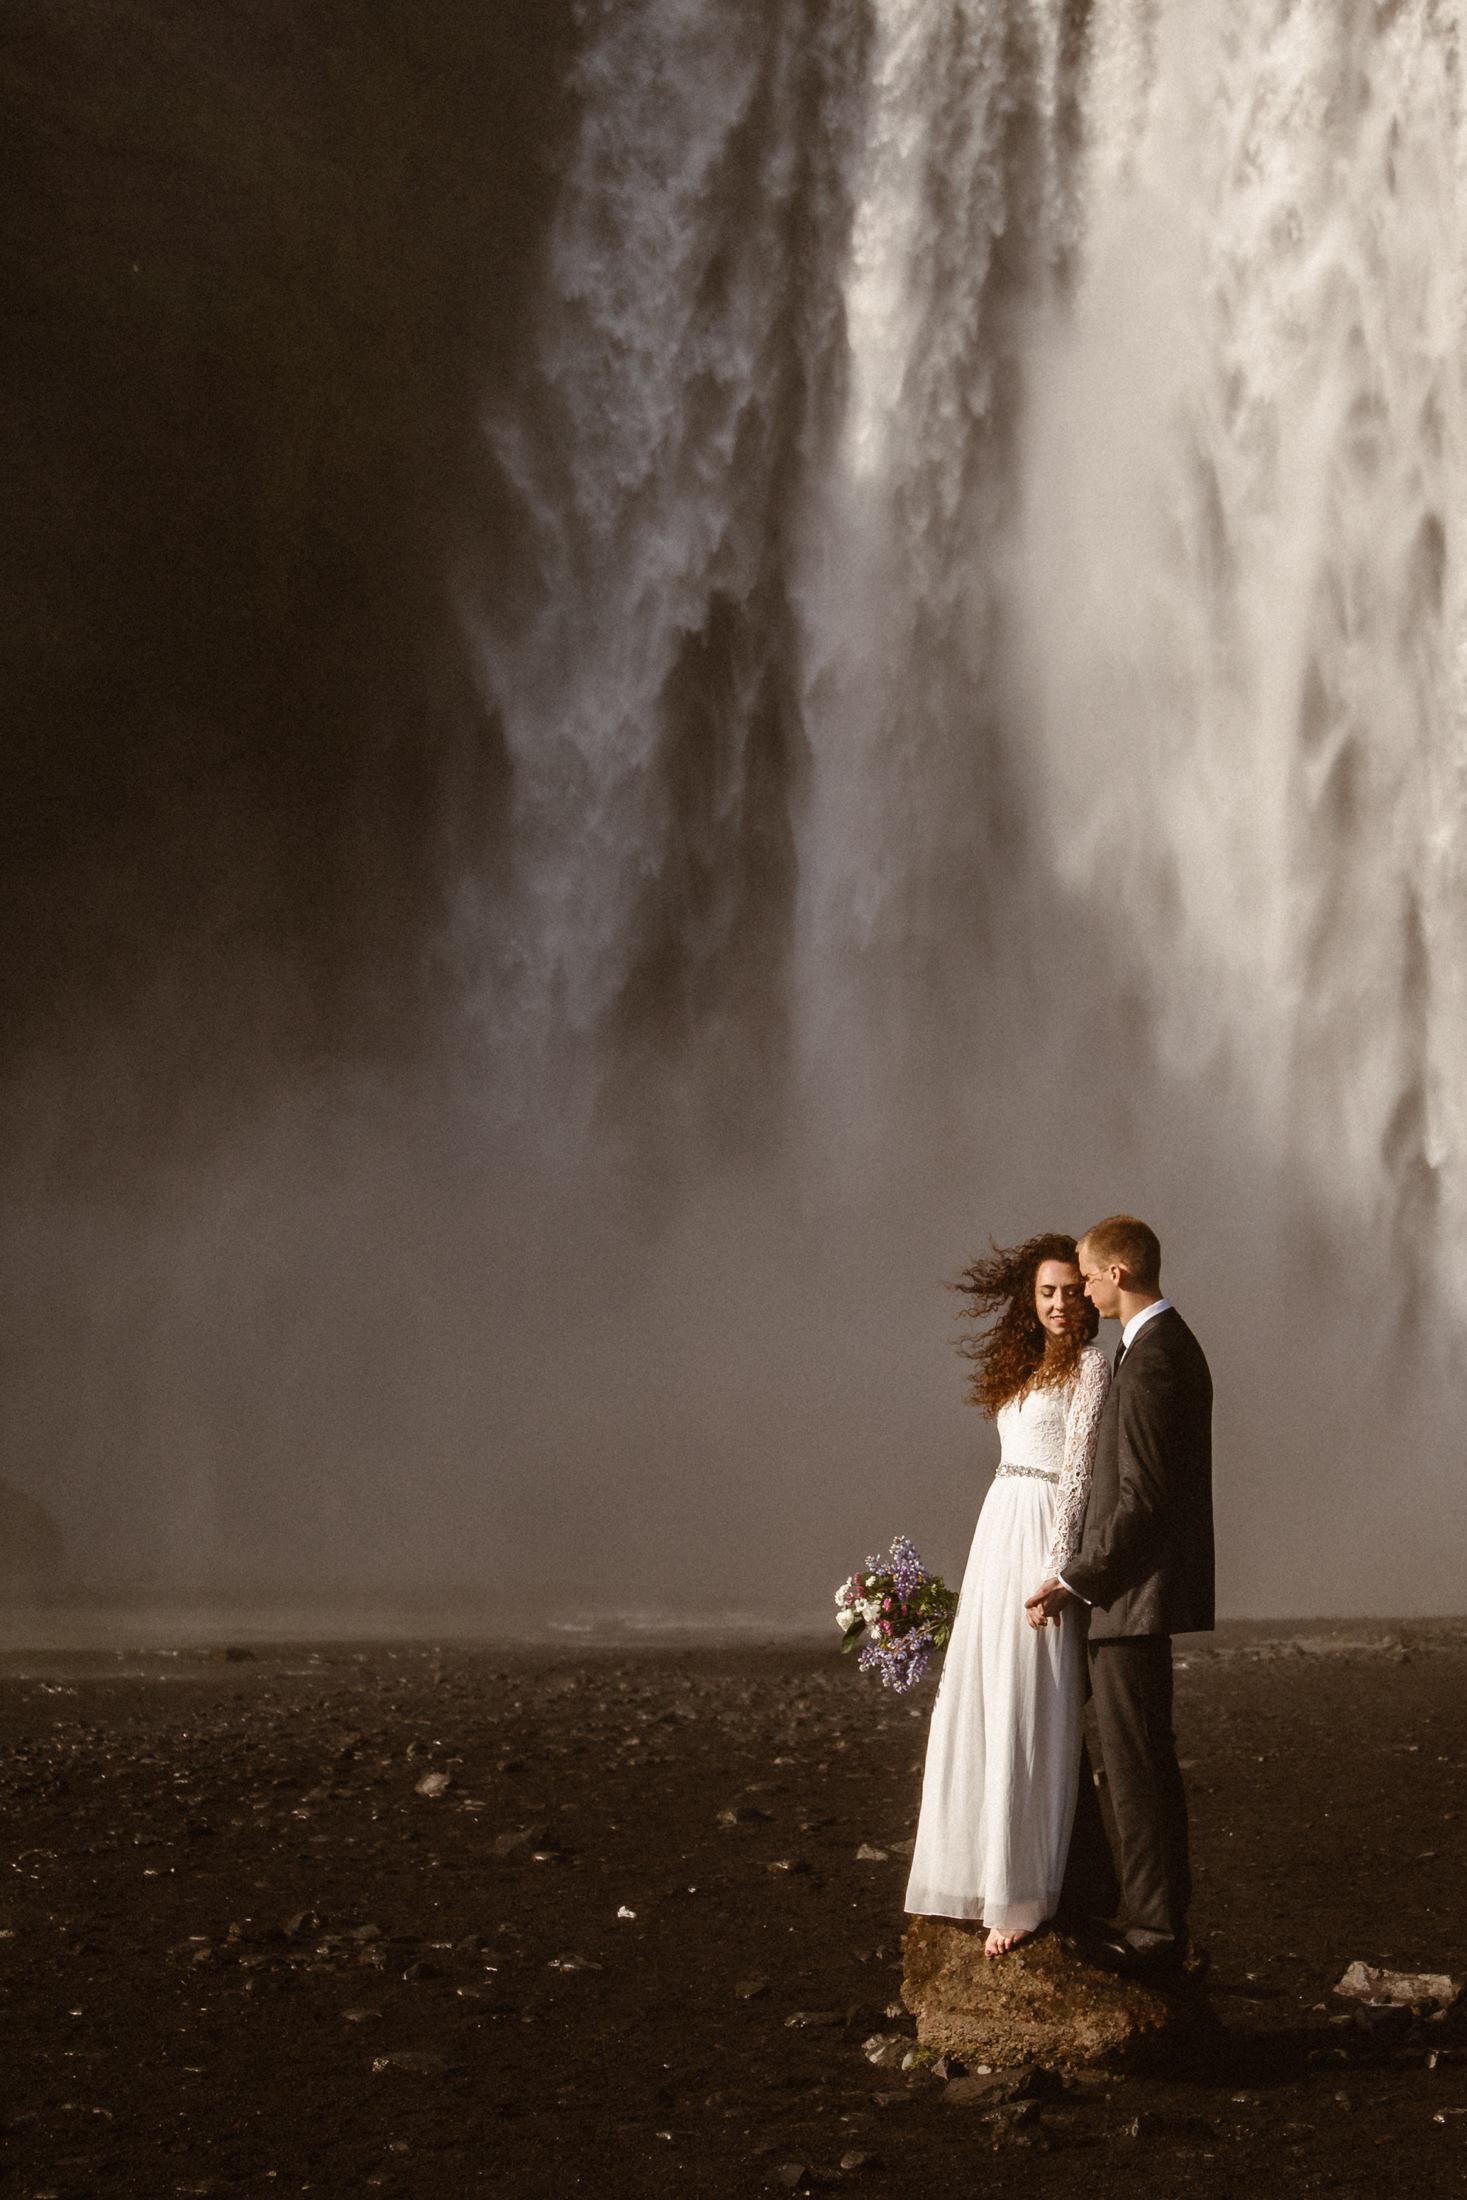 moody-elopement-photos-at-skogafoss-waterfall-in-iceland-narrowleaf-photography-4943.JPG